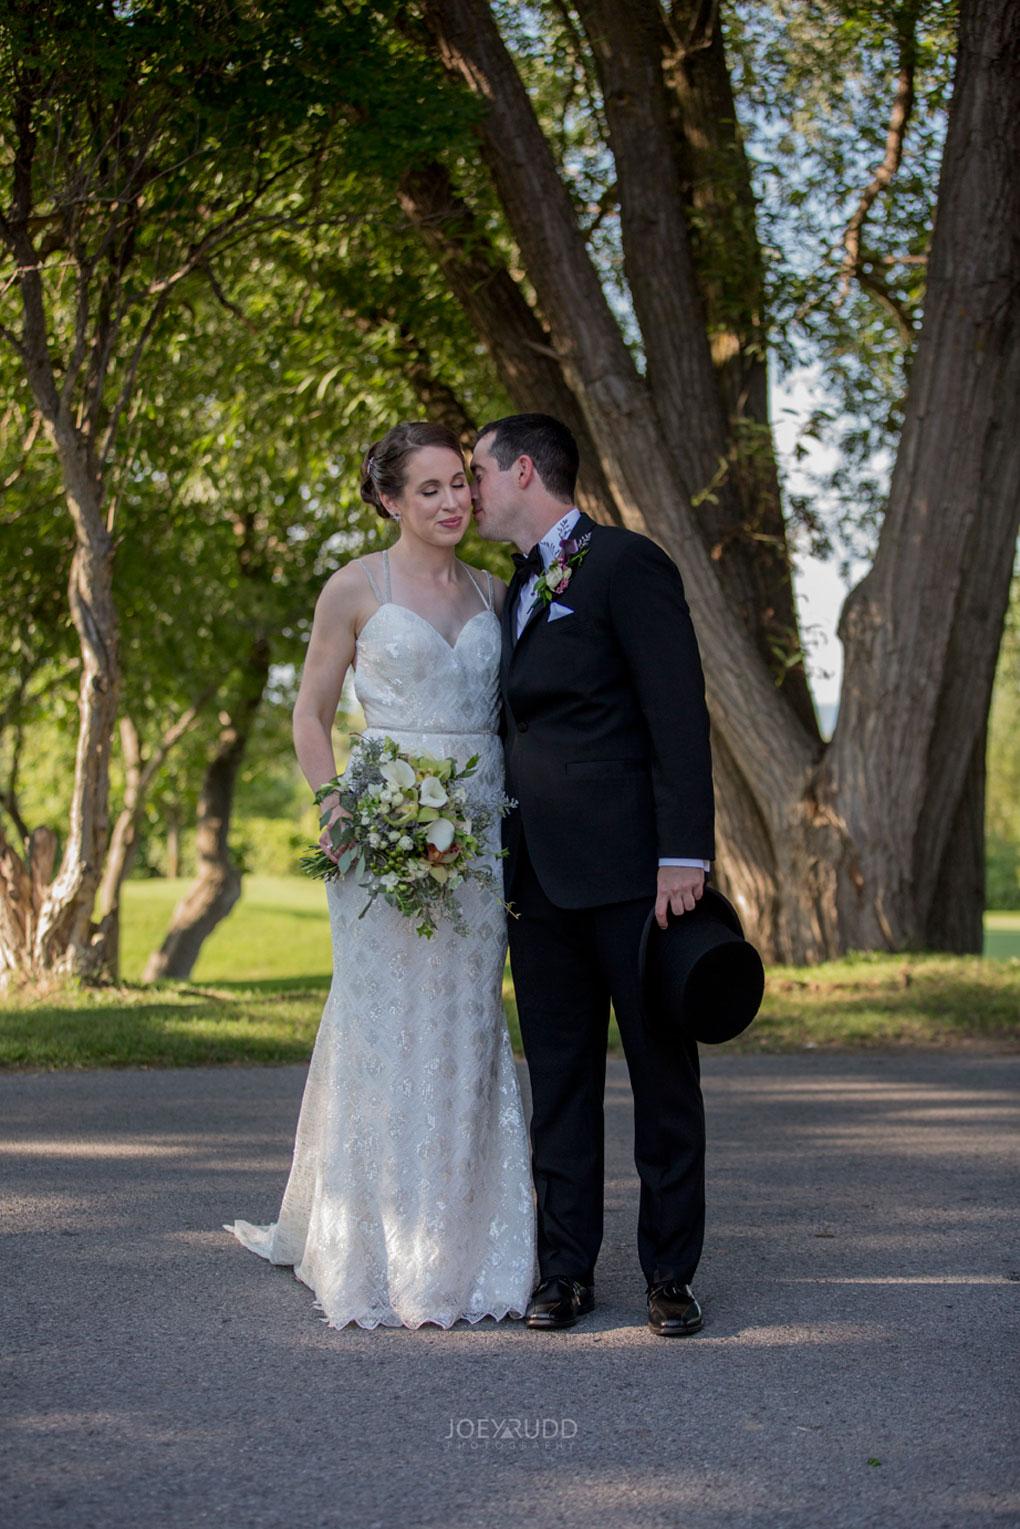 Marshes Wedding, Marshes Golf Club, Ottawa, Ottawa Wedding, Ontario Wedding, Joey Rudd Photography, Wedding Photos, Bride and Groom, Couple at Golf Club